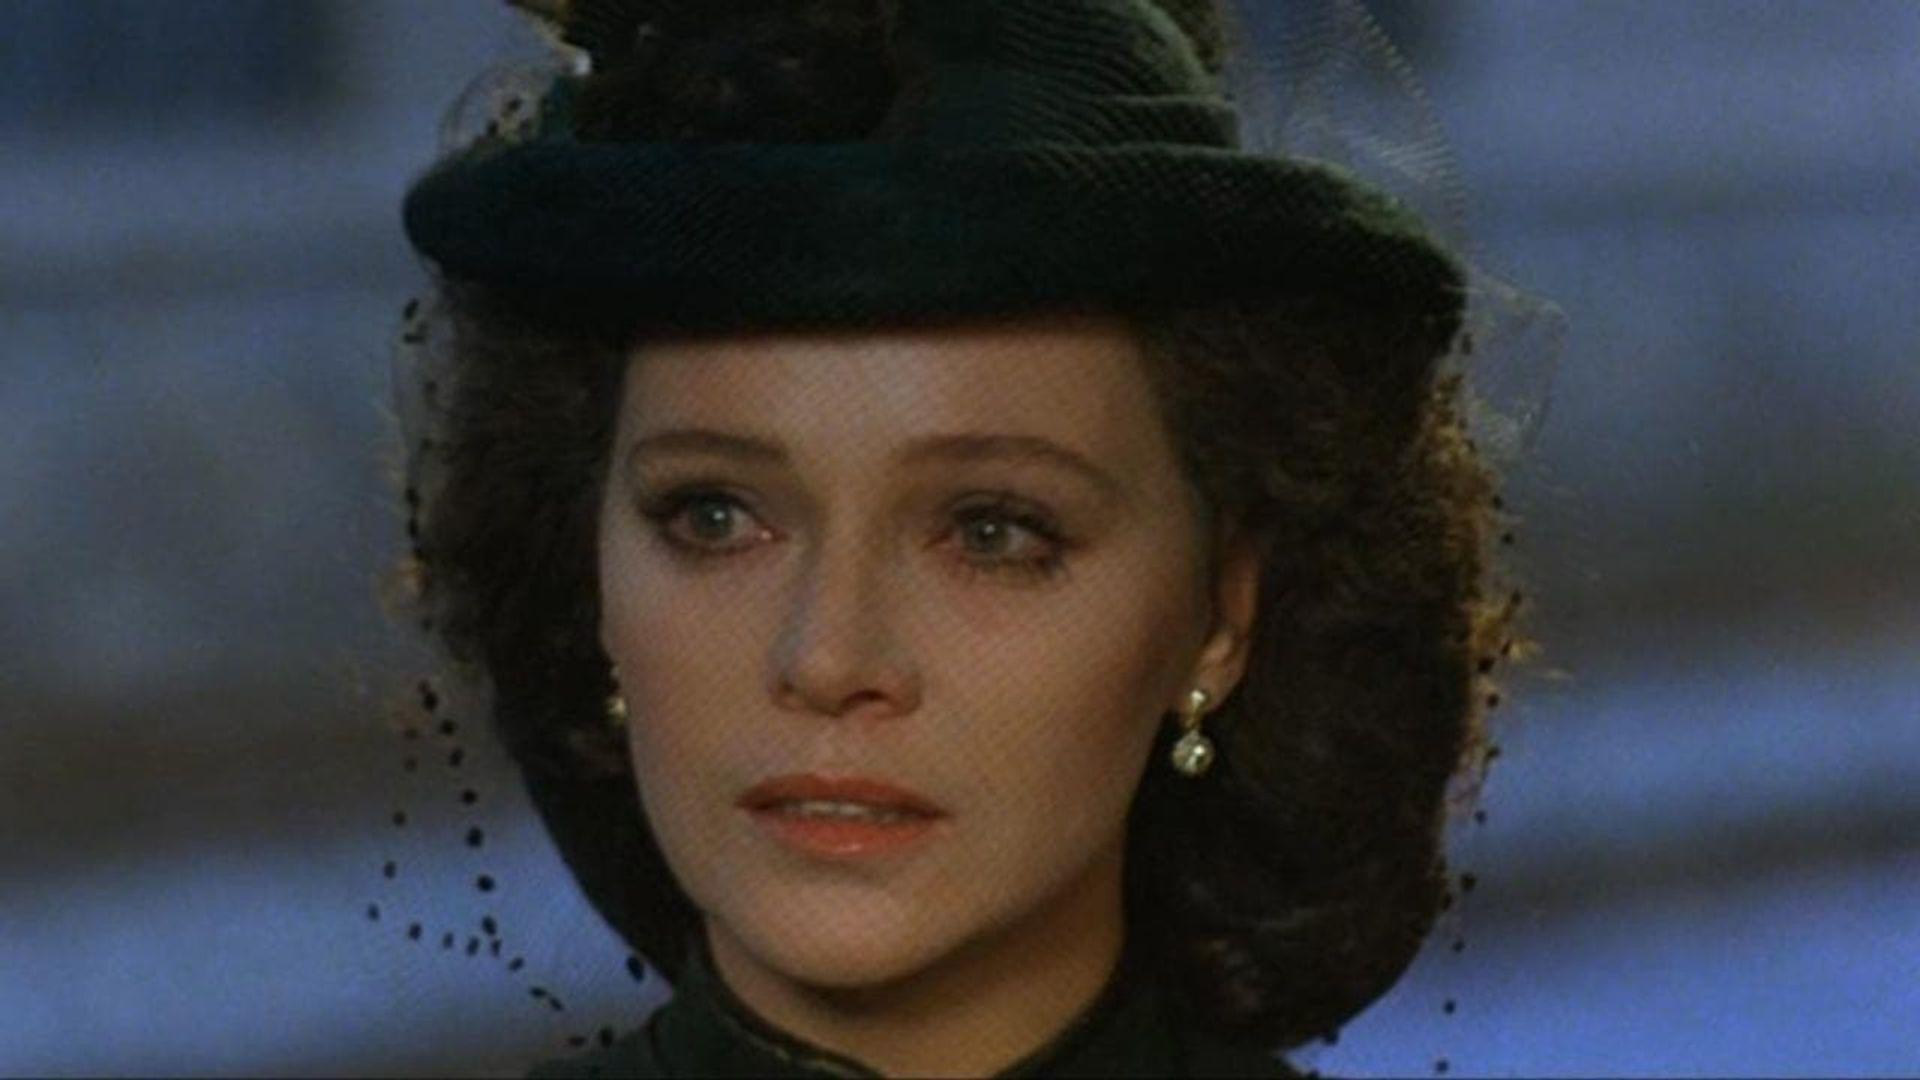 Gladys Reyes (b. 1978),Jeannette Charles Hot video Paul Scofield (1922?008),Pamela Franklin